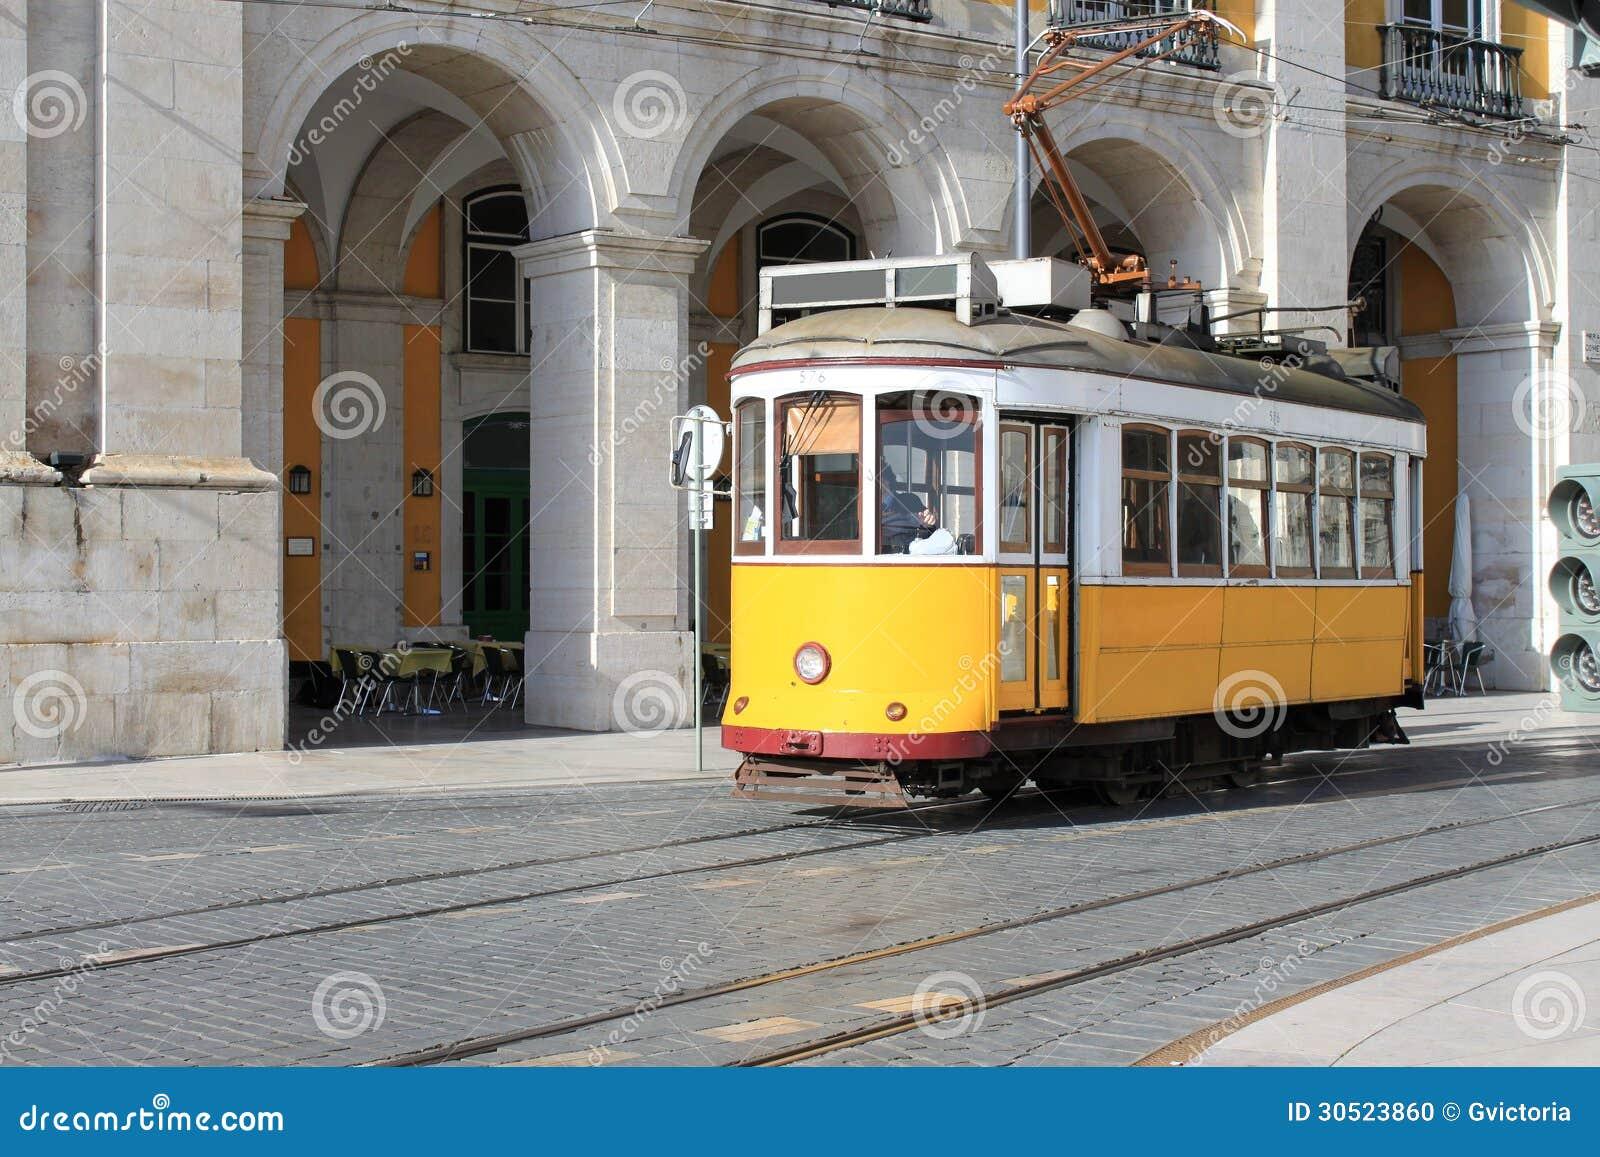 Tram in Lissabon, Portugal